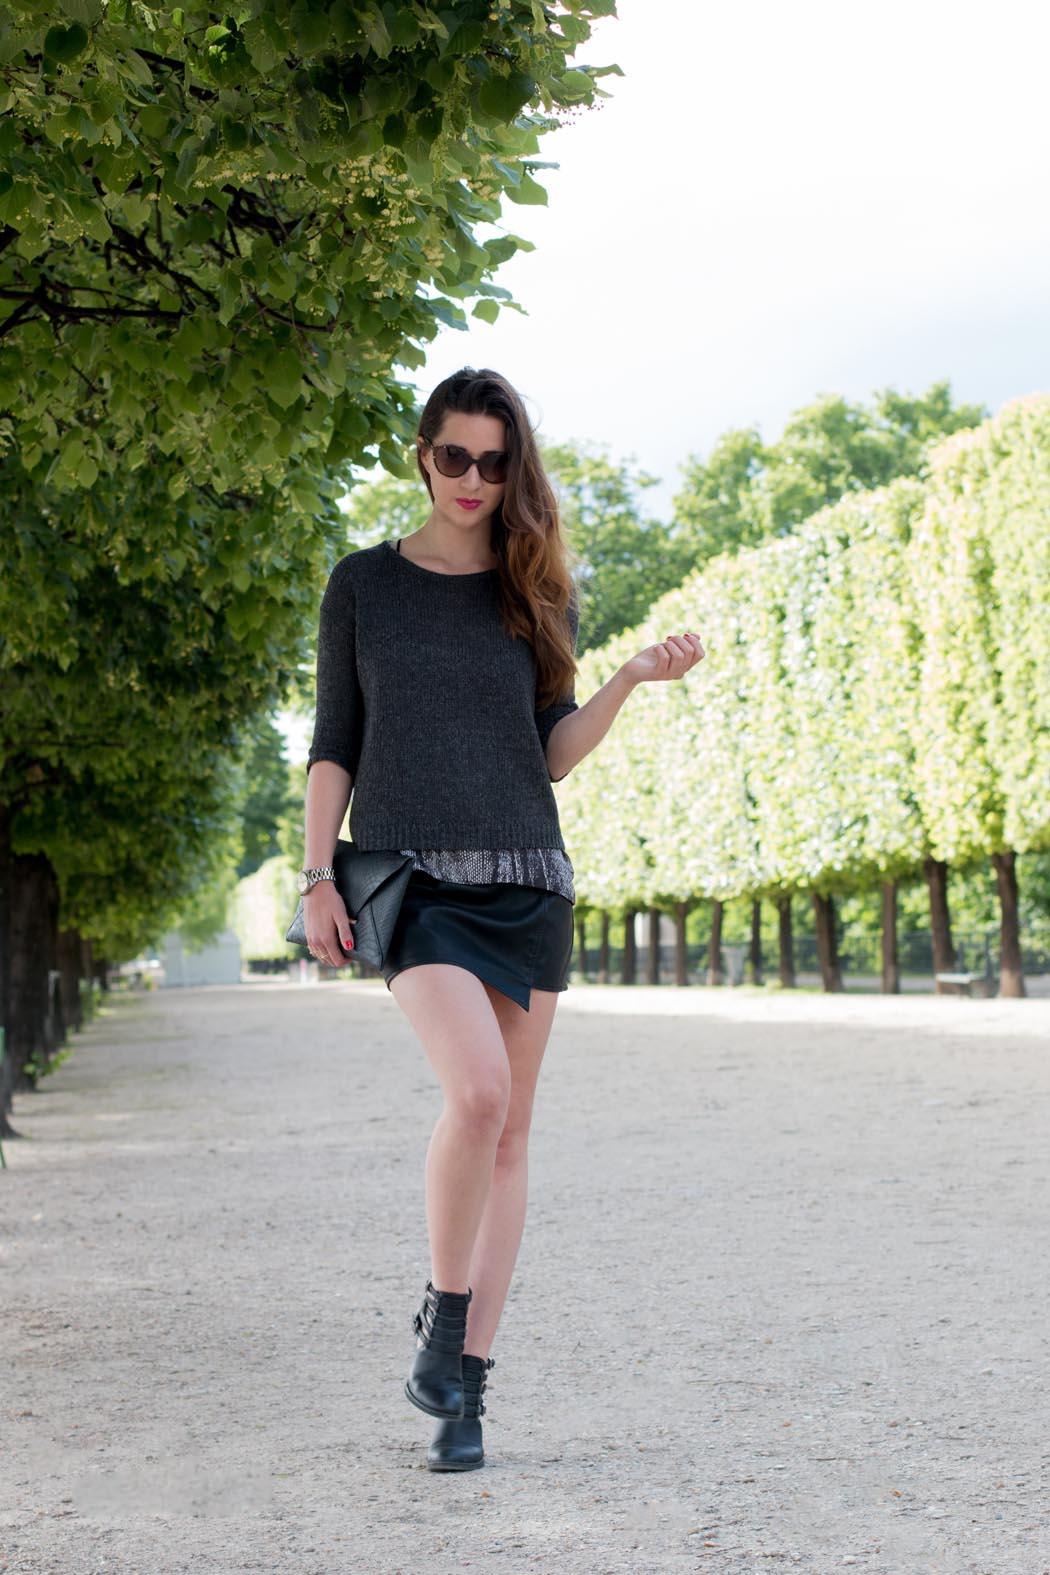 Lindarella-Paris-Fashionblogger-Michael-Kors-Bcbg-allblack-7